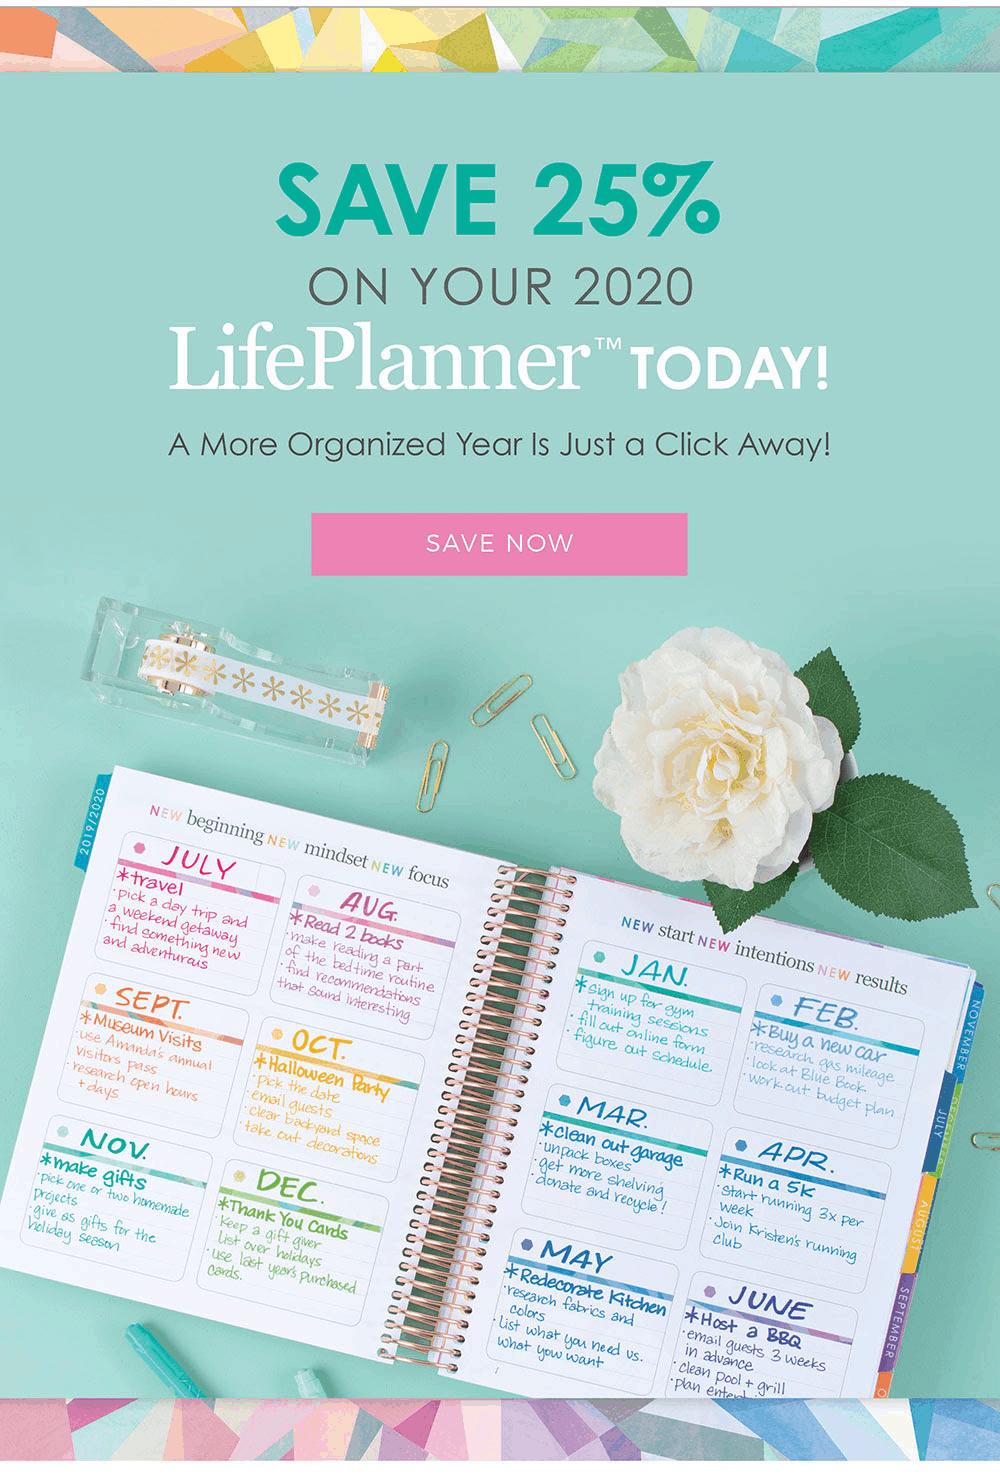 Erin Condren Coupon Save 25 On 2020 Life Planners Hello Subscription Erin Condren Coupon Erin Condren Erin Condren Stickers